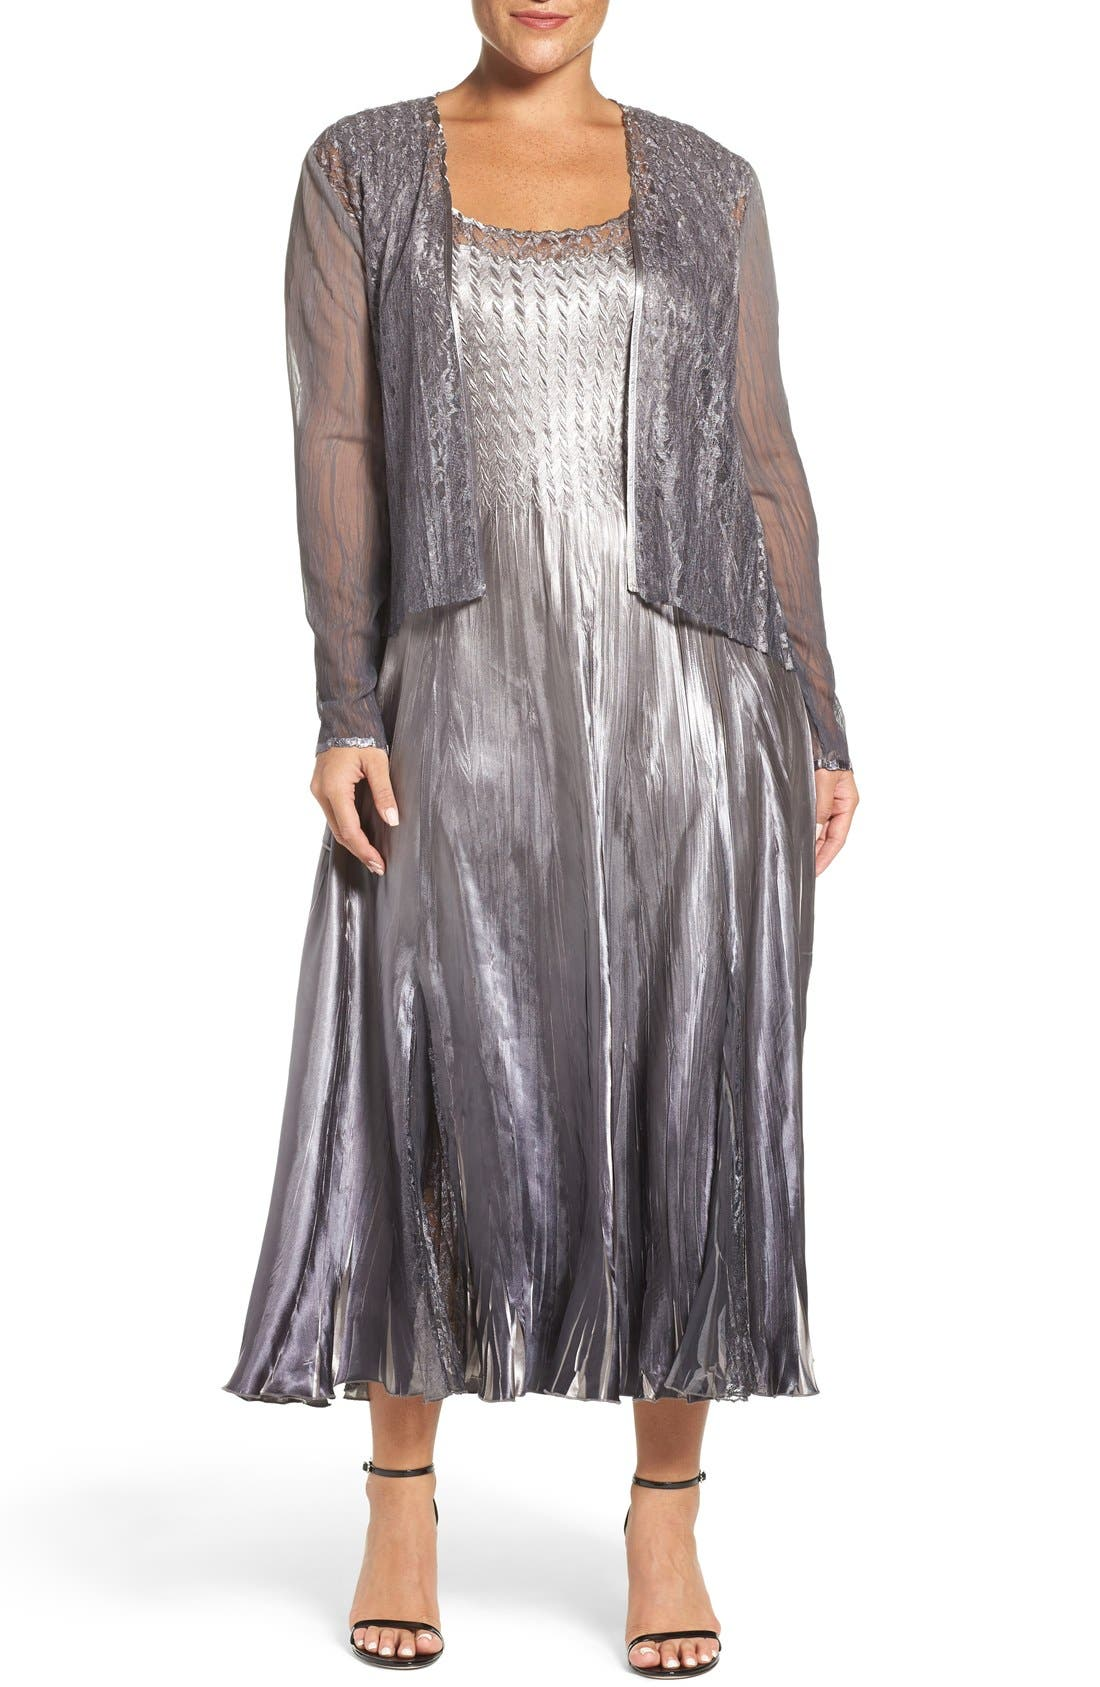 Alternate Image 1 Selected - Komarov A-Line Dress & Lace Panel Jacket (Plus Size)